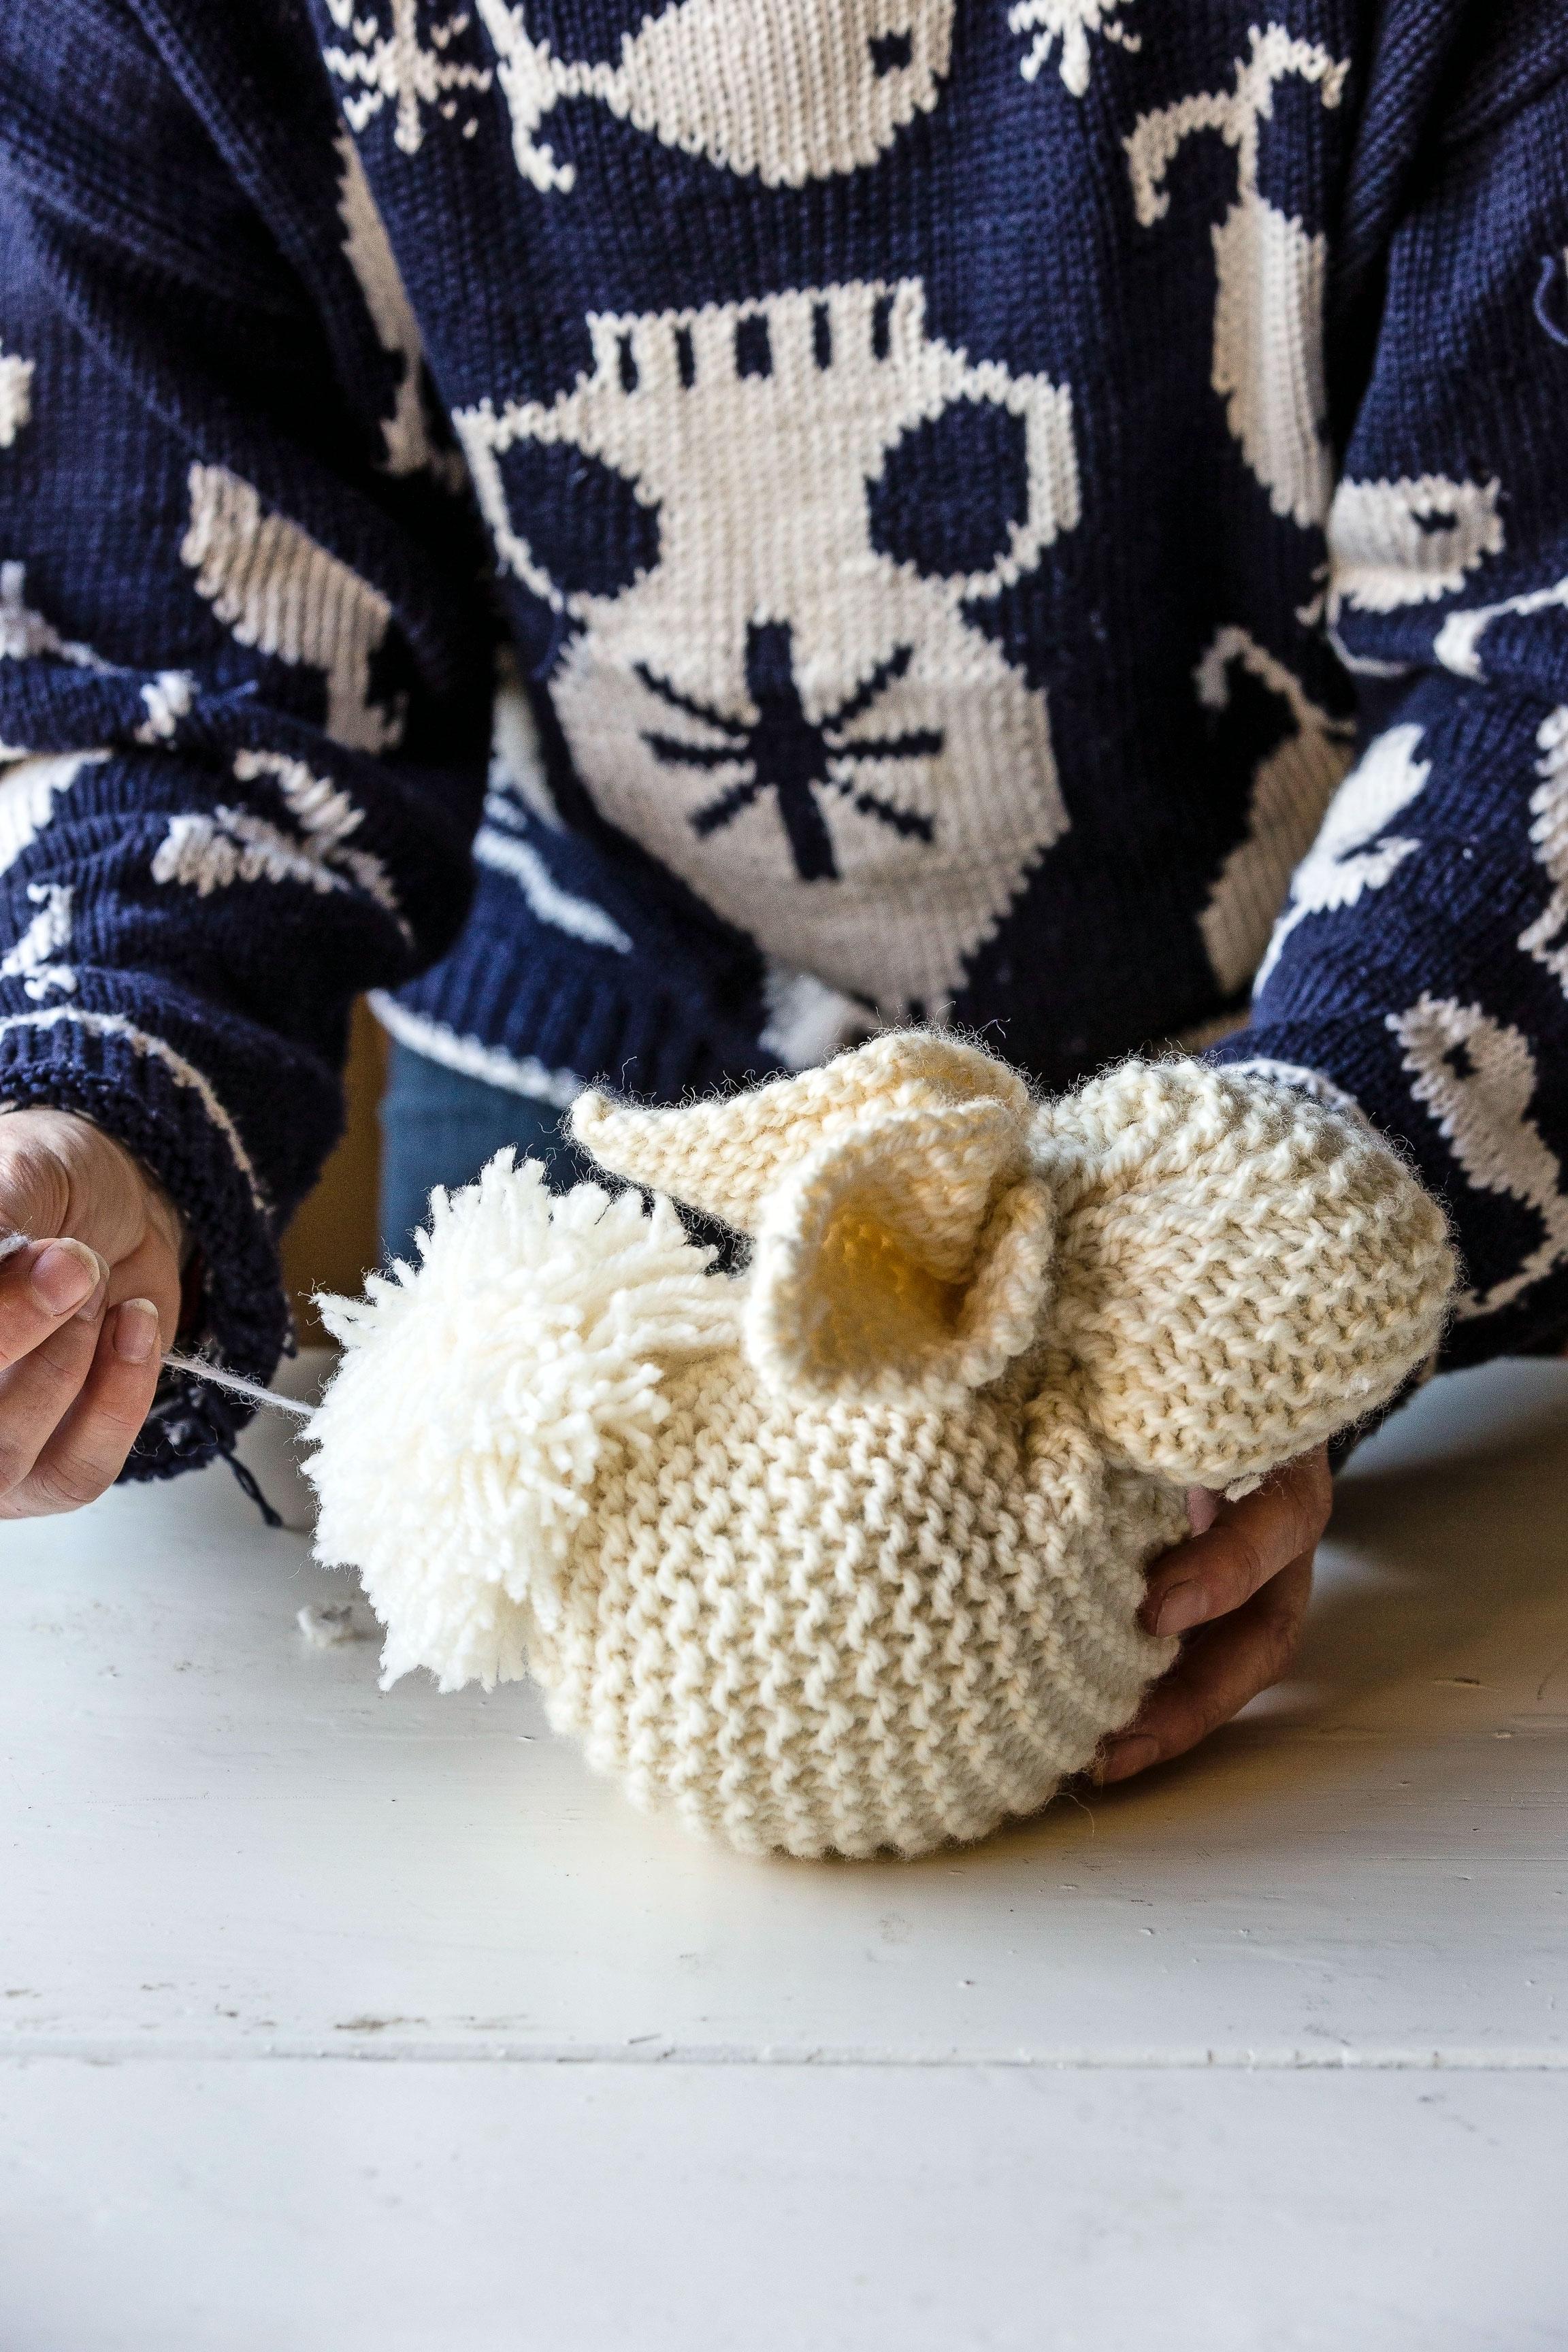 Craft-project-fabric-bunnies-7.jpg